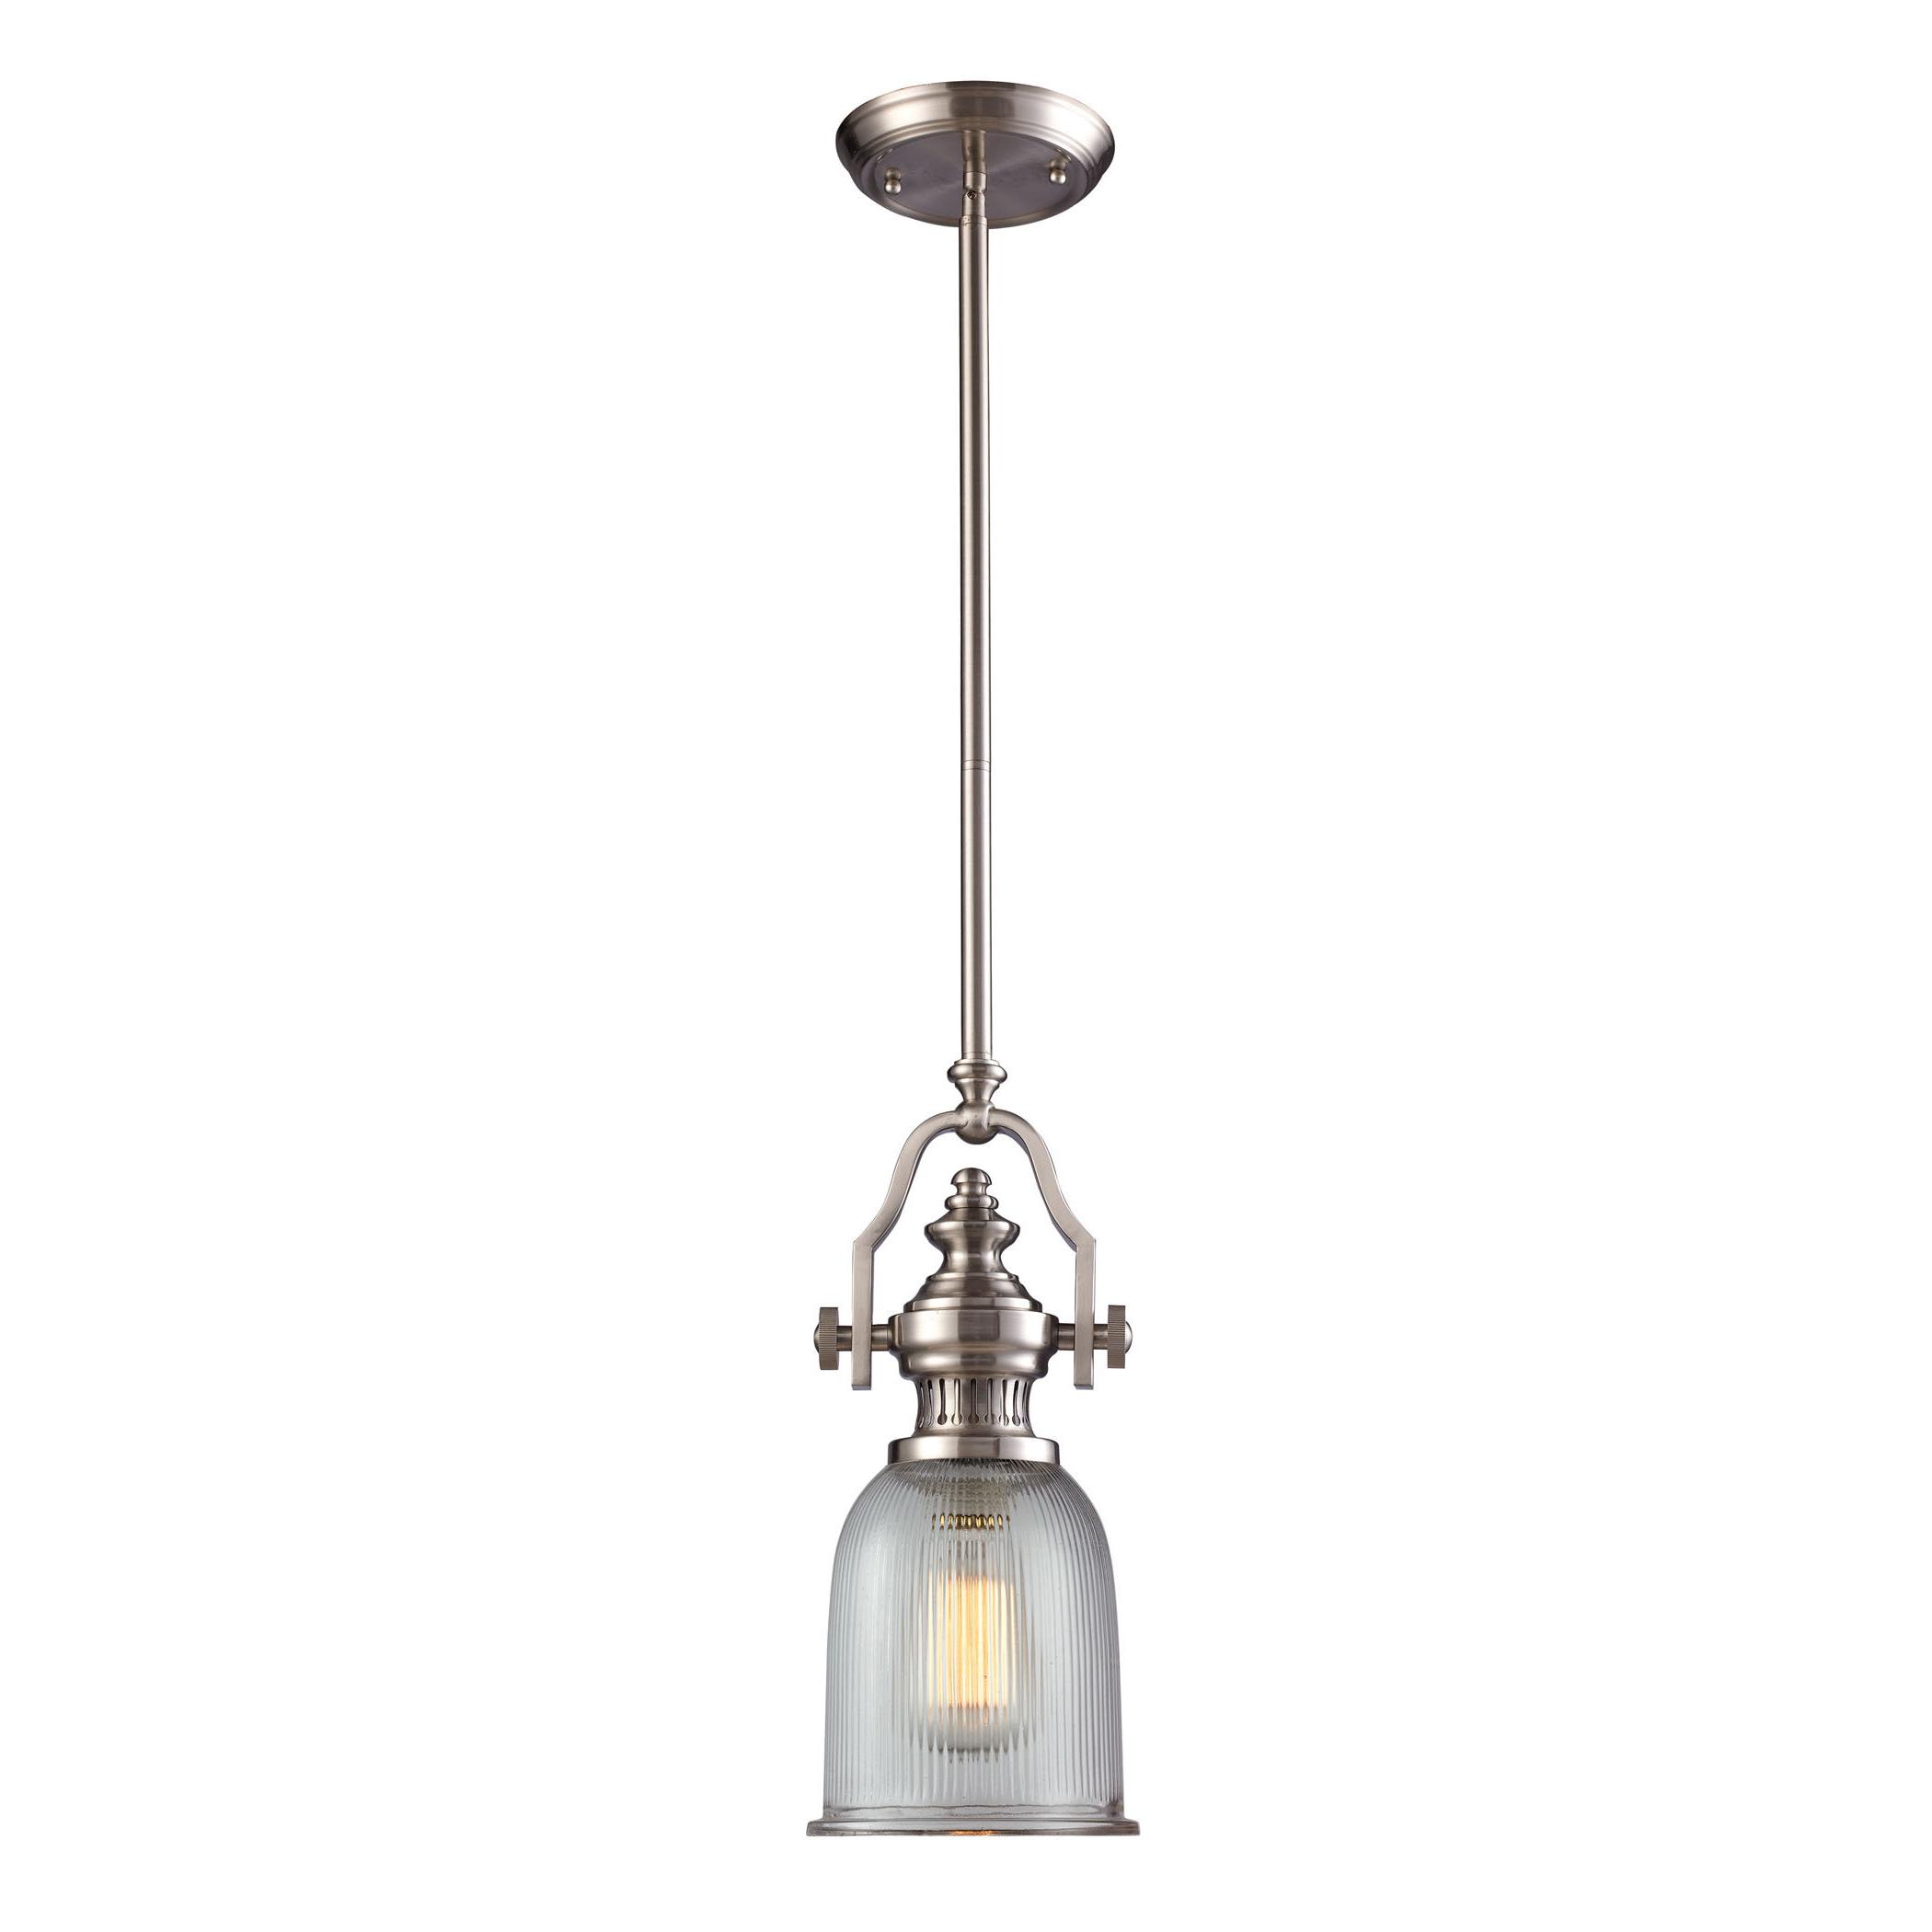 Birch Lane™ Heritage Erico 1 Light Single Bell Pendant In Current Grullon Scroll 1 Light Single Bell Pendants (View 4 of 20)